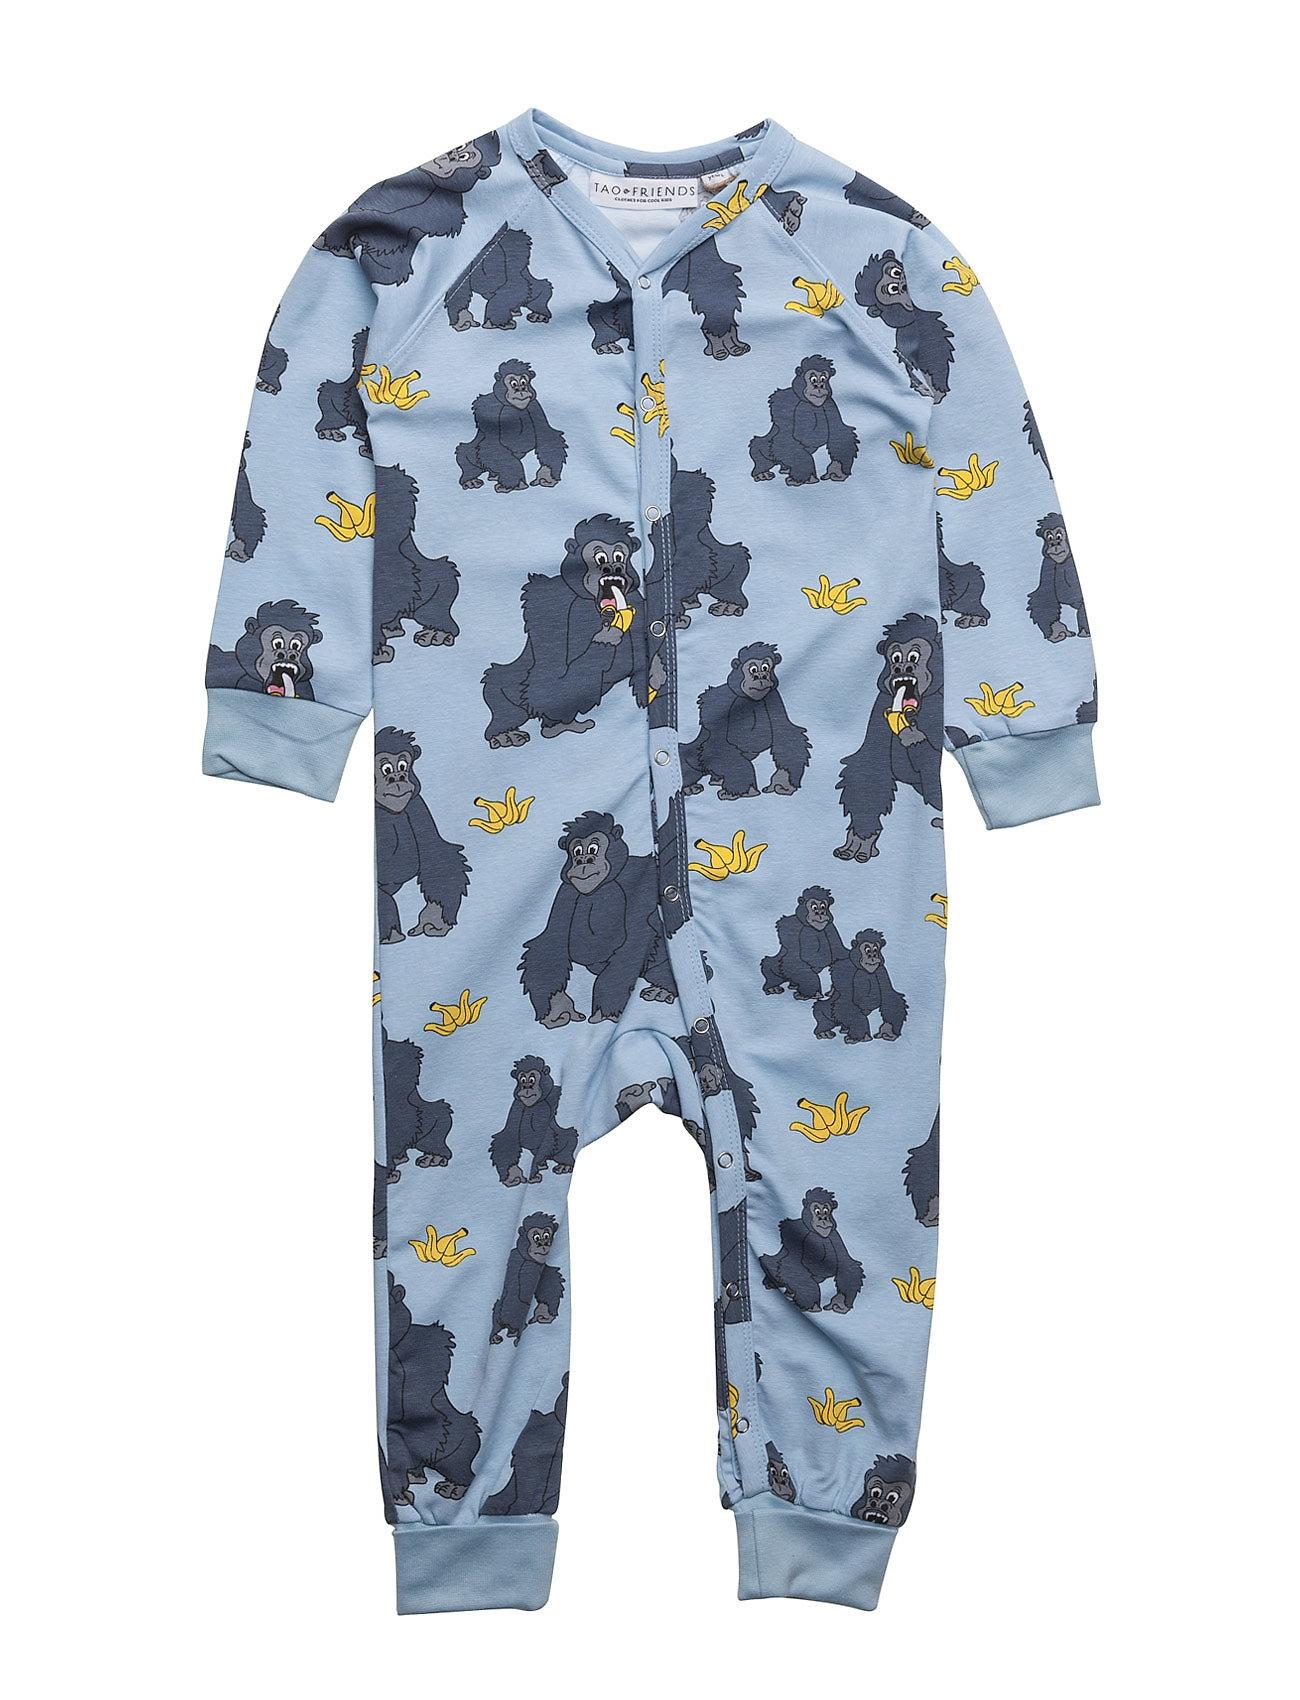 tao & friends – Pj gorillan multi-animal blue one-piece på boozt.com dk